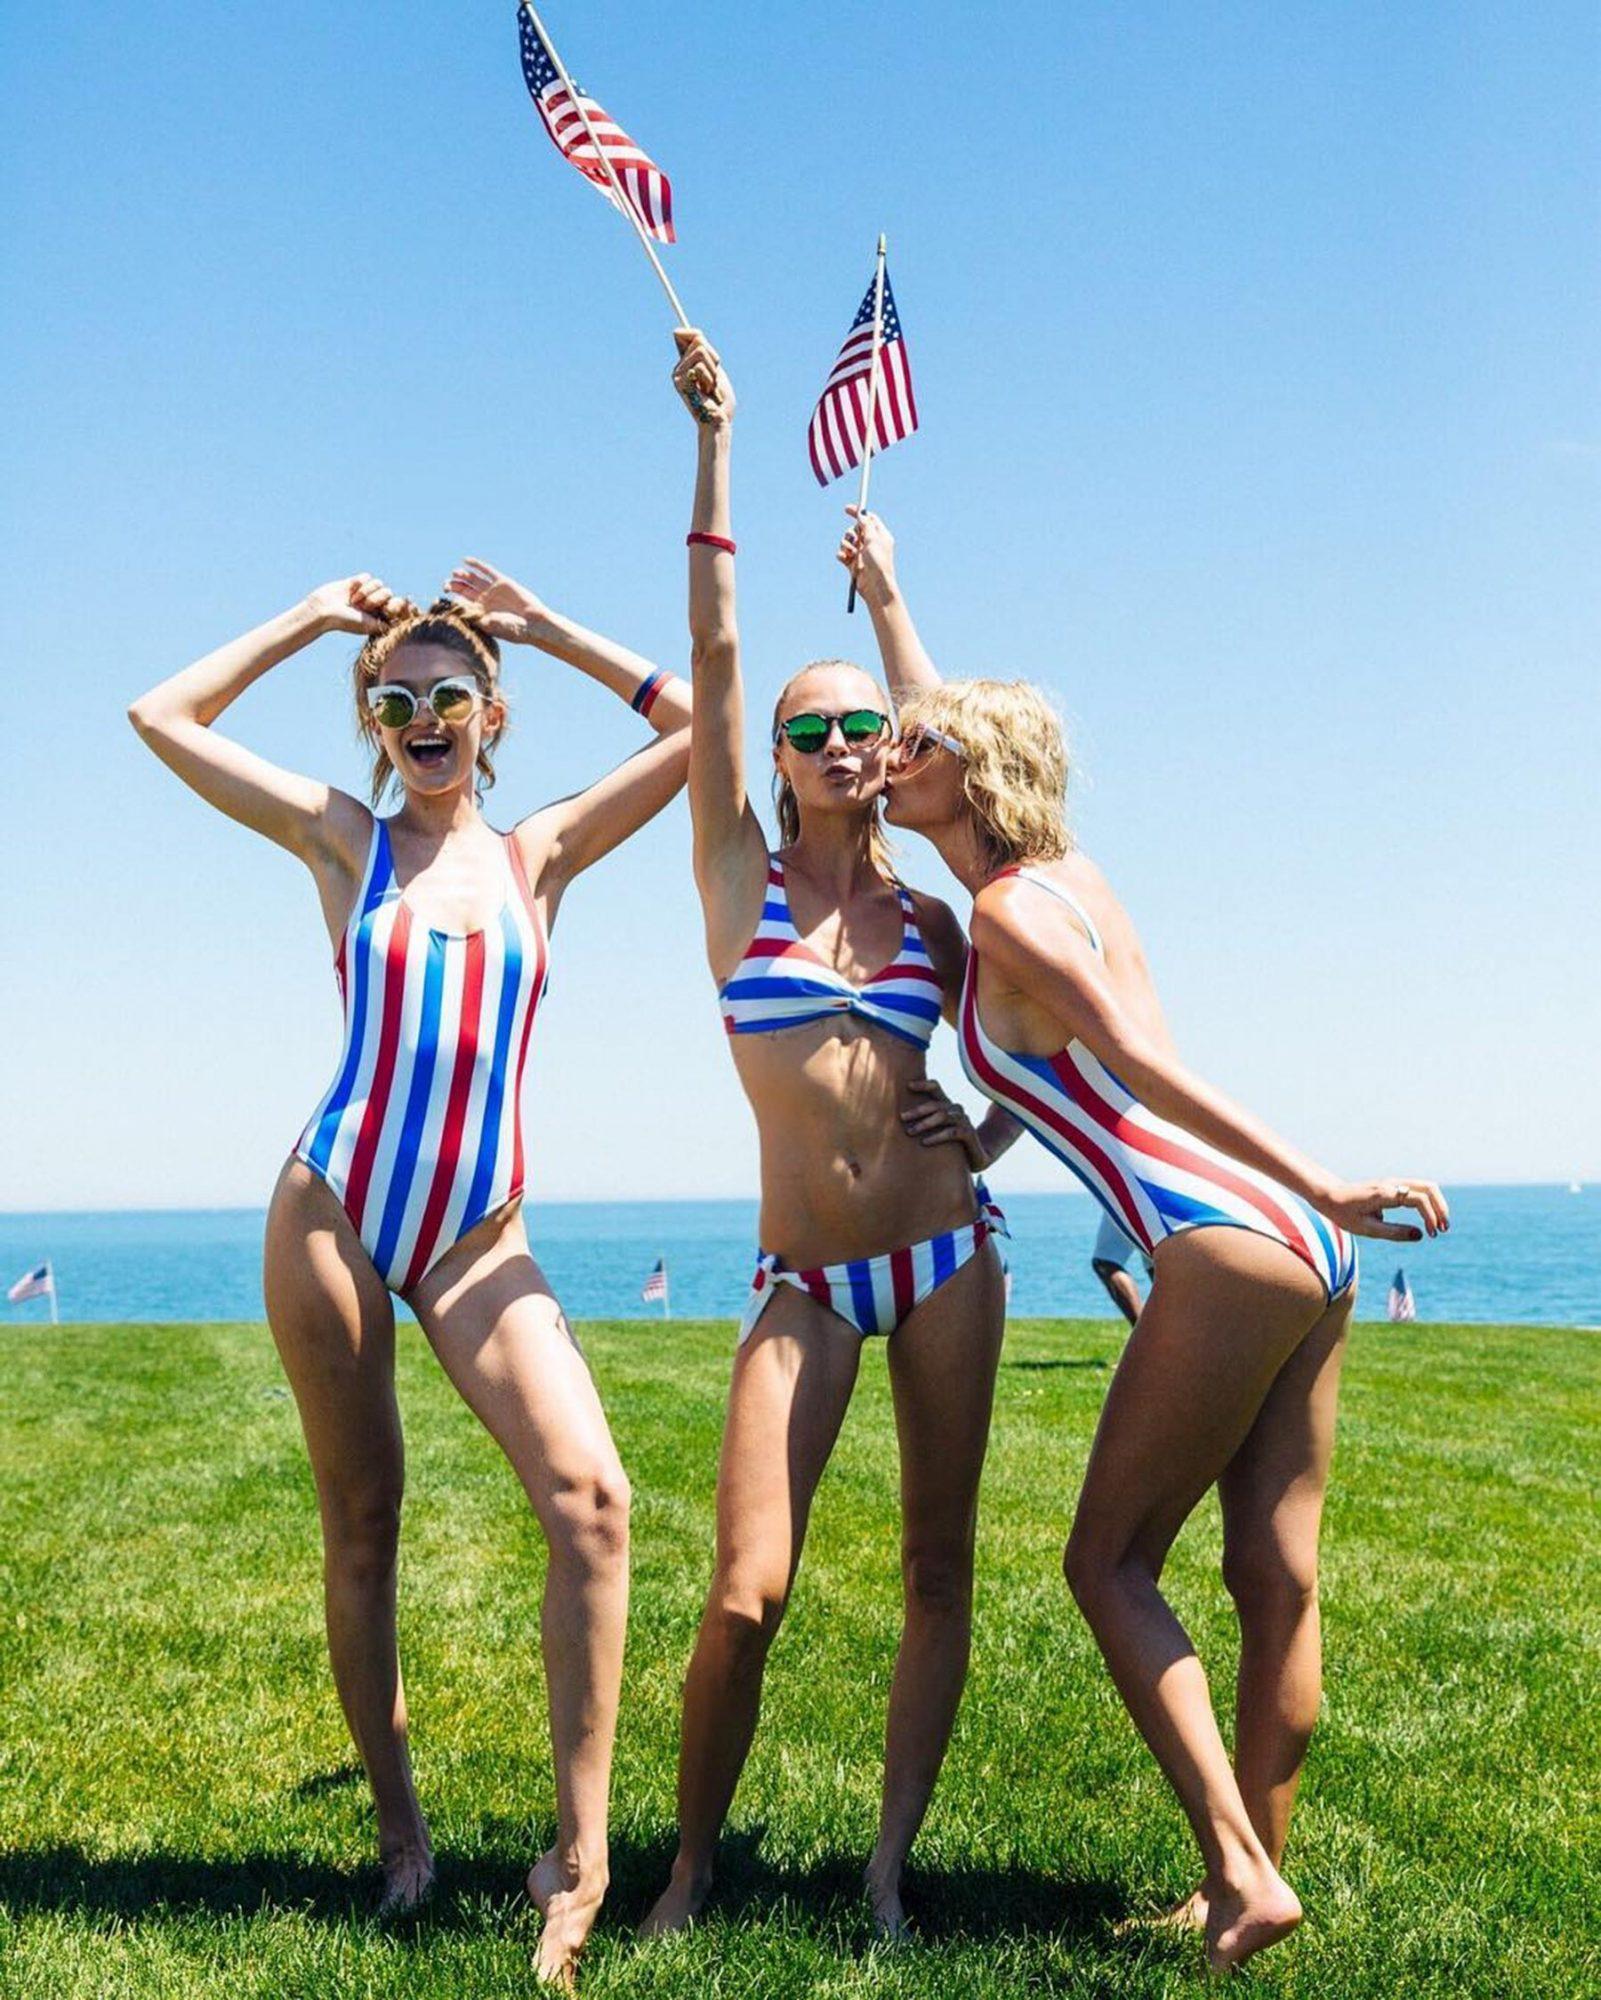 https://www.instagram.com/p/BHgMSX_BP3A/ Gigi Hadid, Cara Delevingne and Taylor Swift CR: Cara Delevingne/Instagram